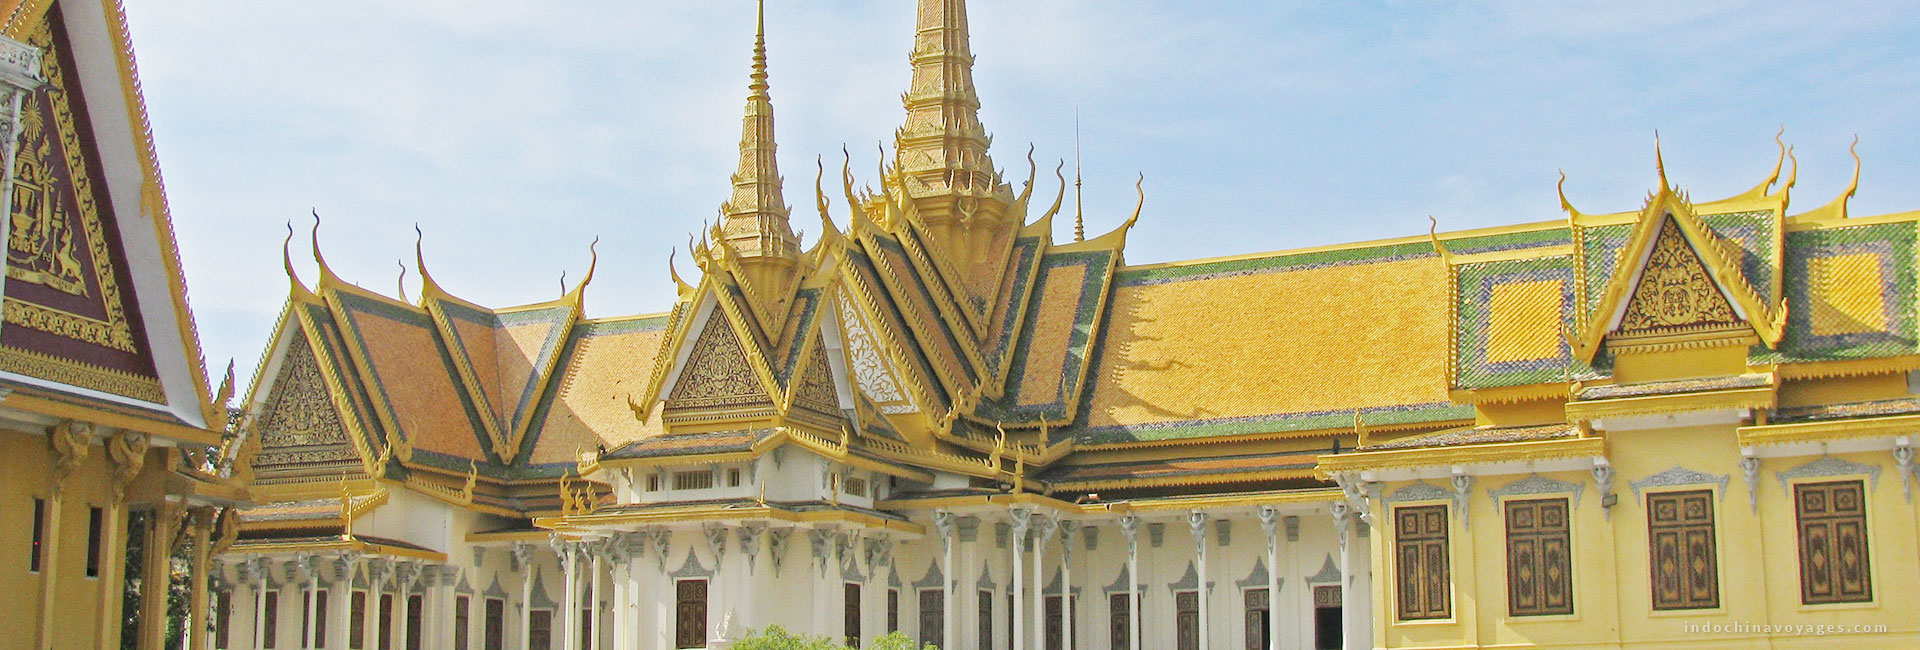 Phnom Penh City Highlights Tour